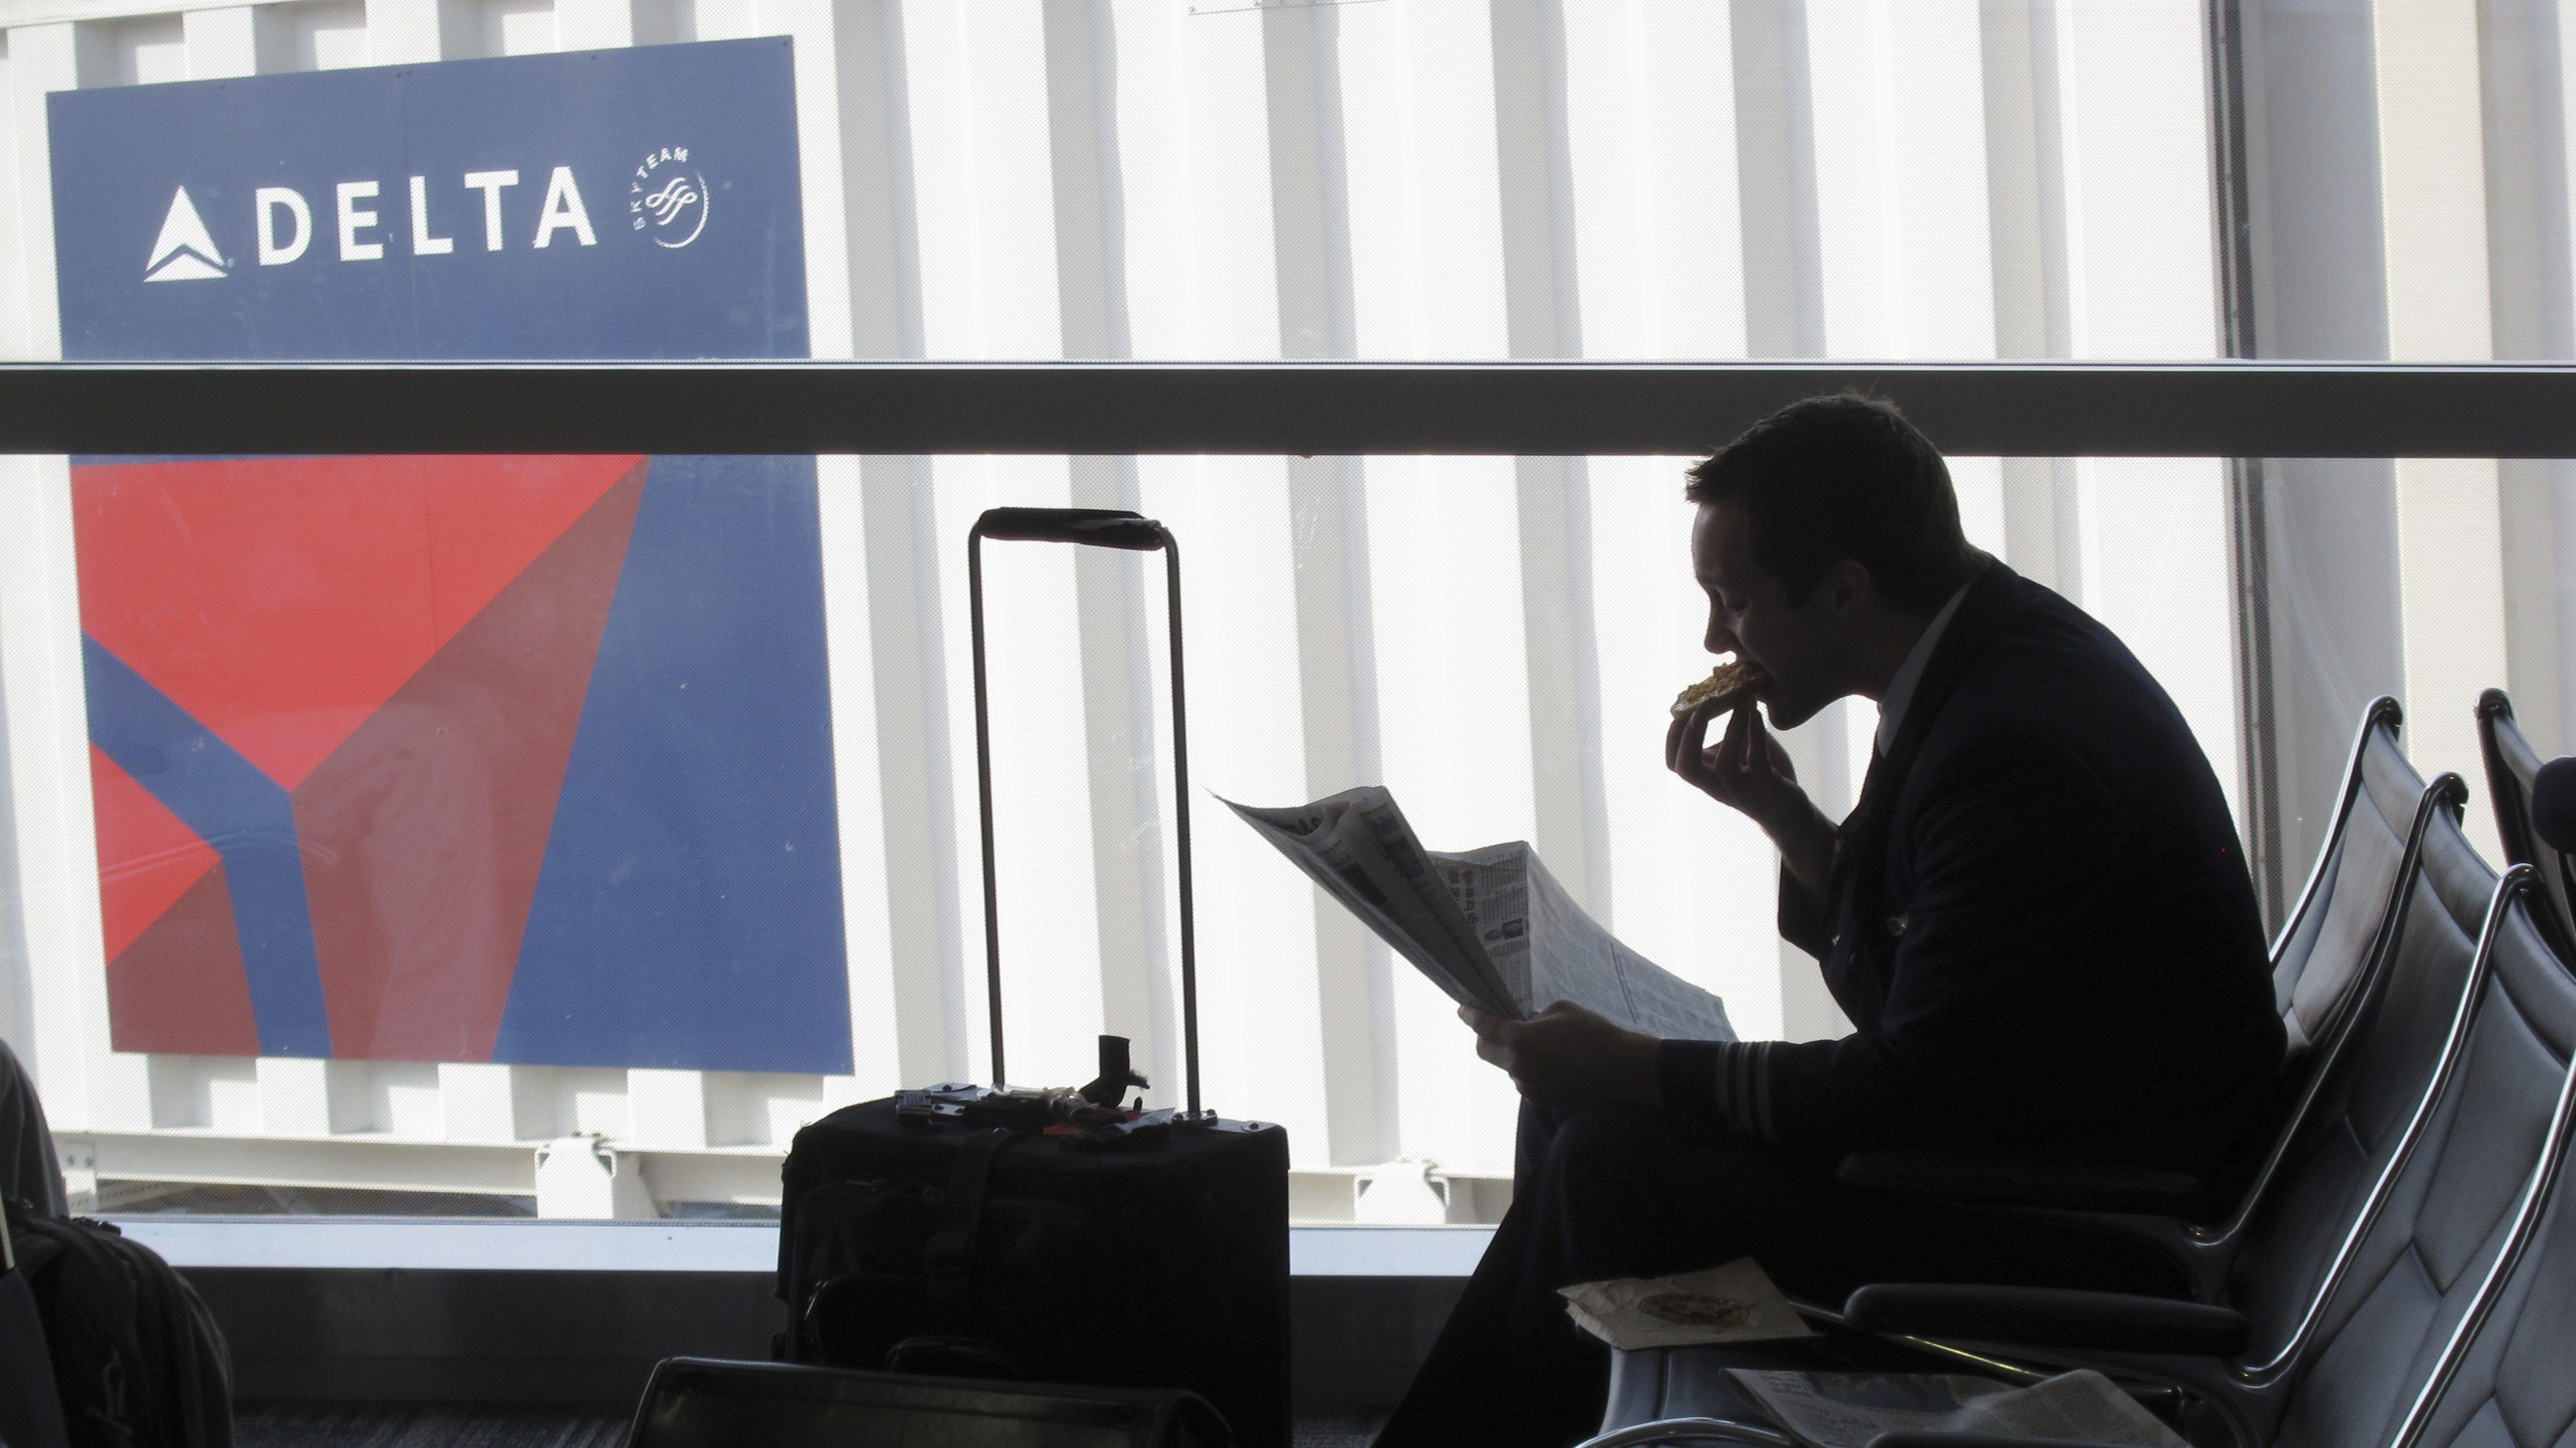 A passenger waits for his flight near a Delta Air Lines logo at Detriot Airport November 20, 2010.